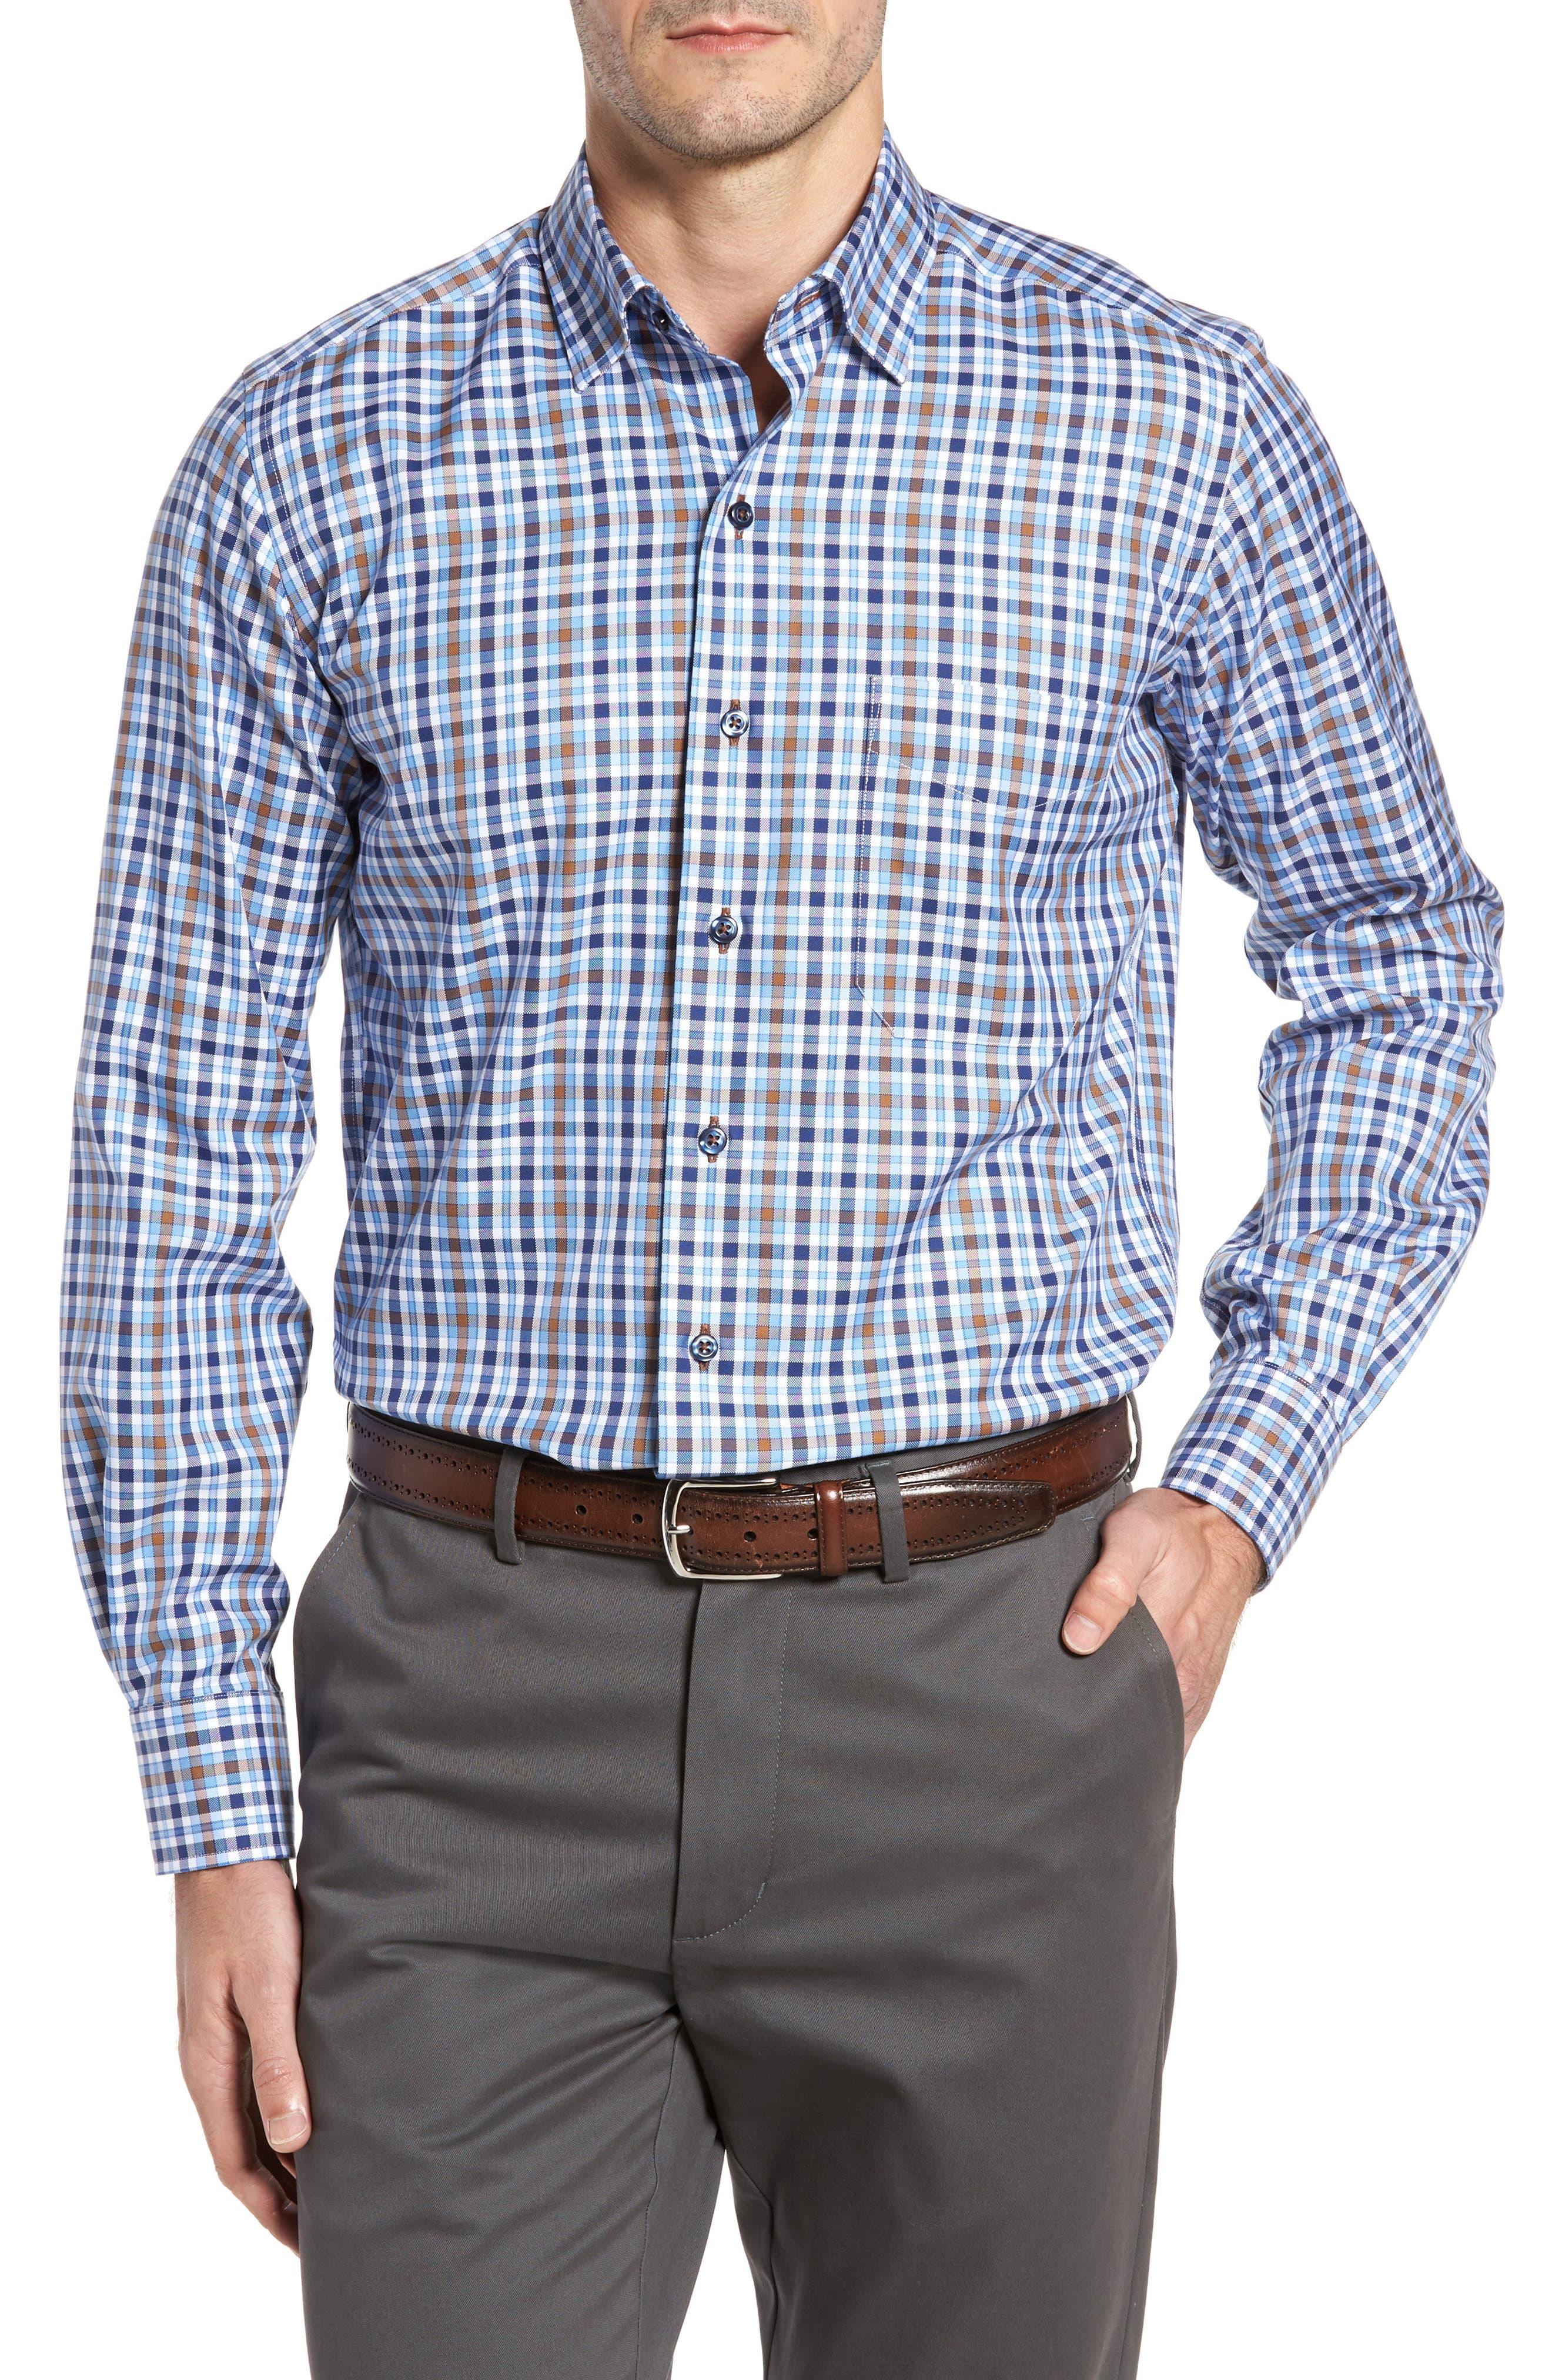 Regular Fit Plaid Sport Shirt,                         Main,                         color, Blue/ Chocolate